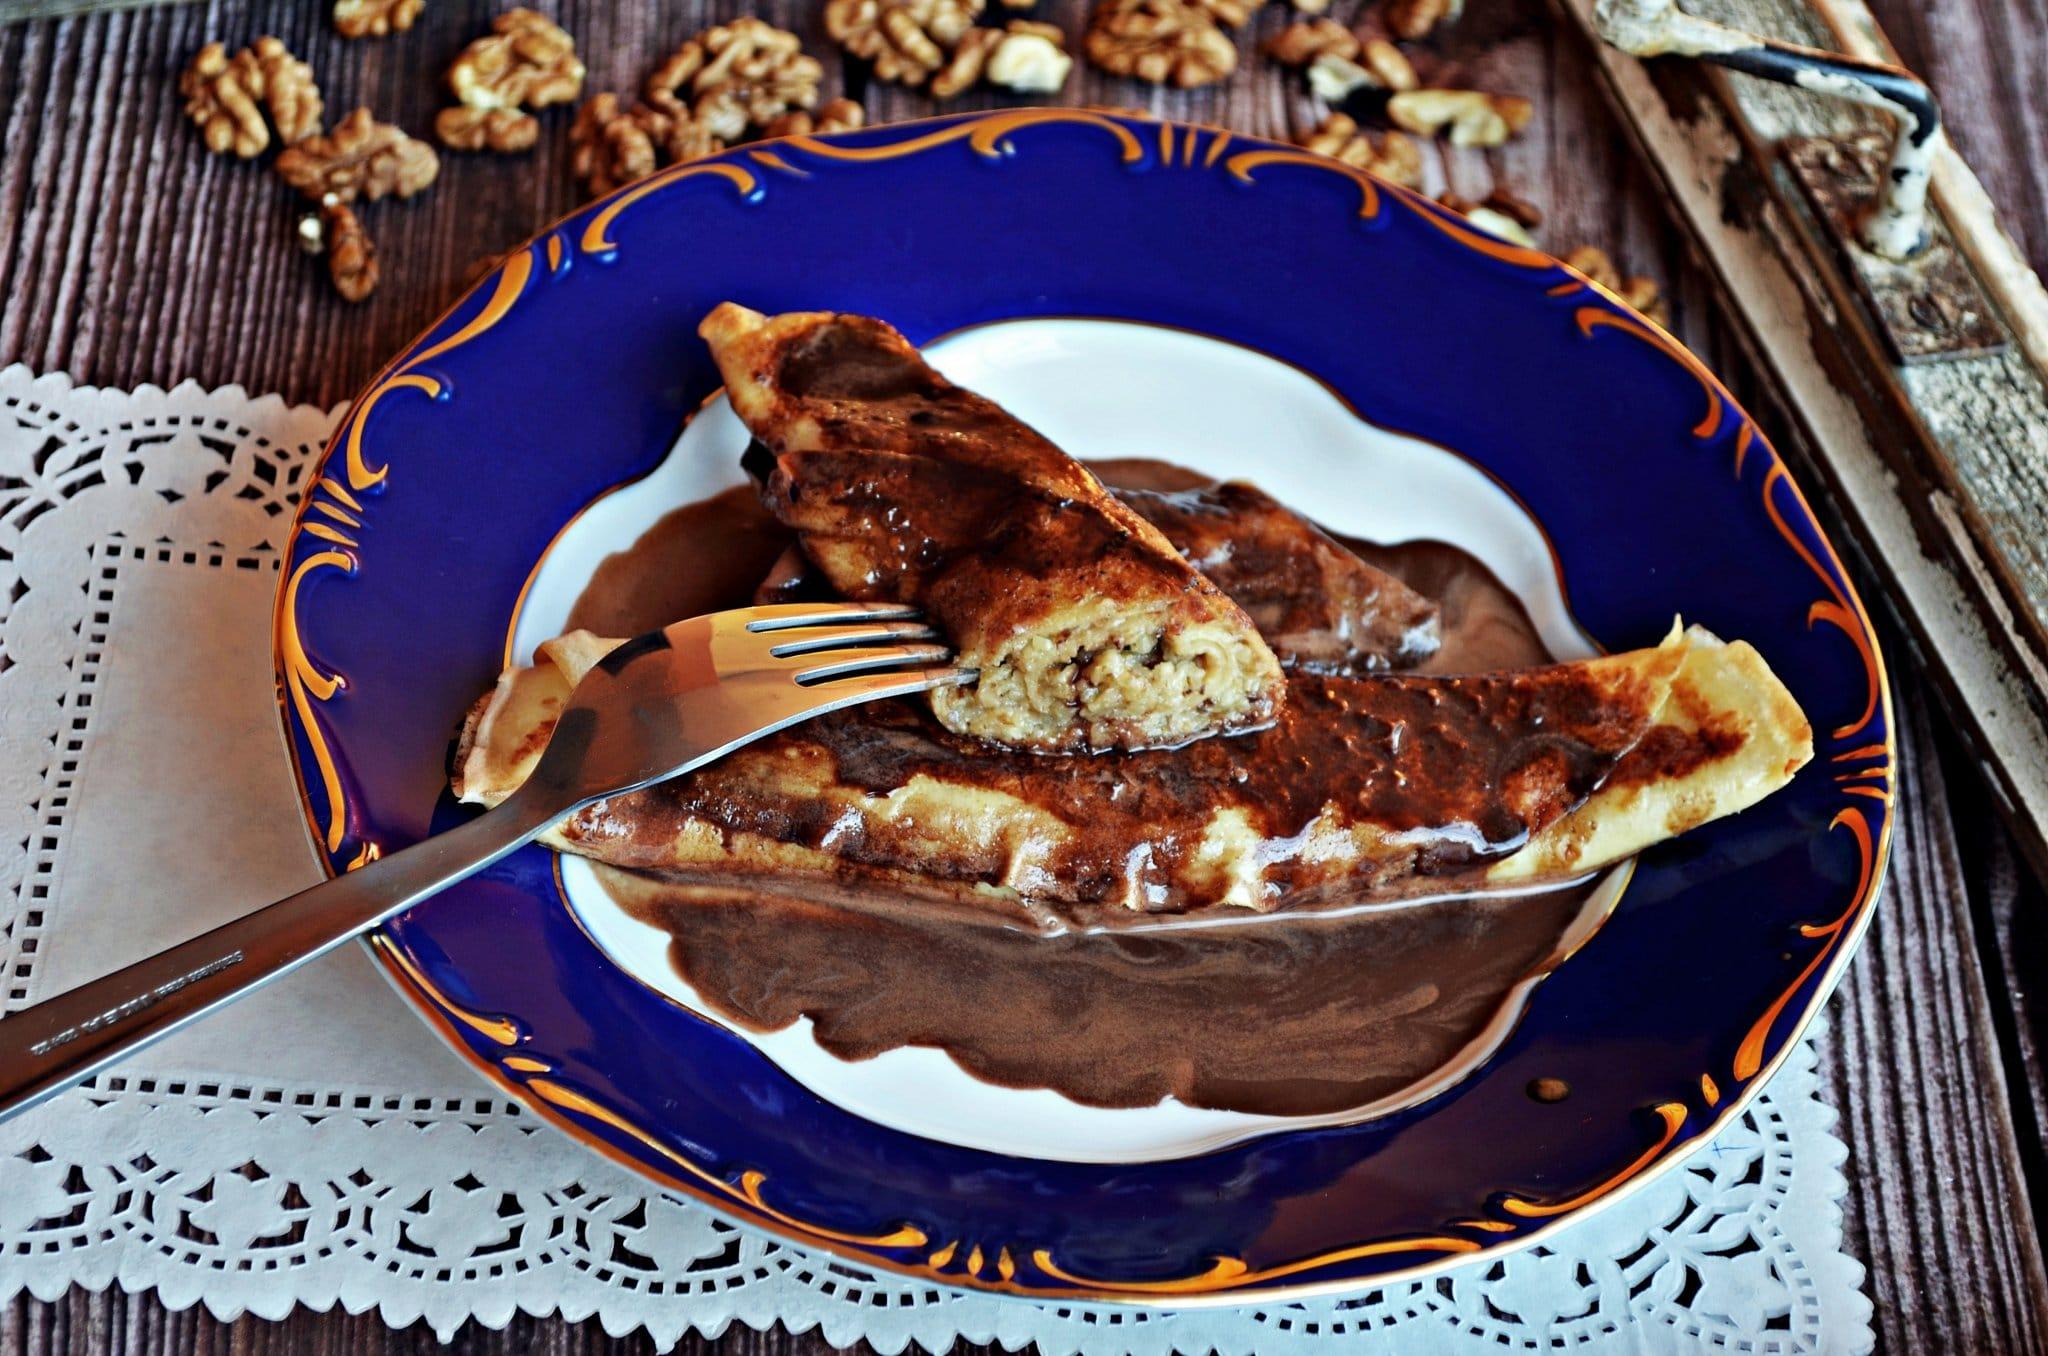 pâtisseries hongroises - crepe Gundel palacsinta